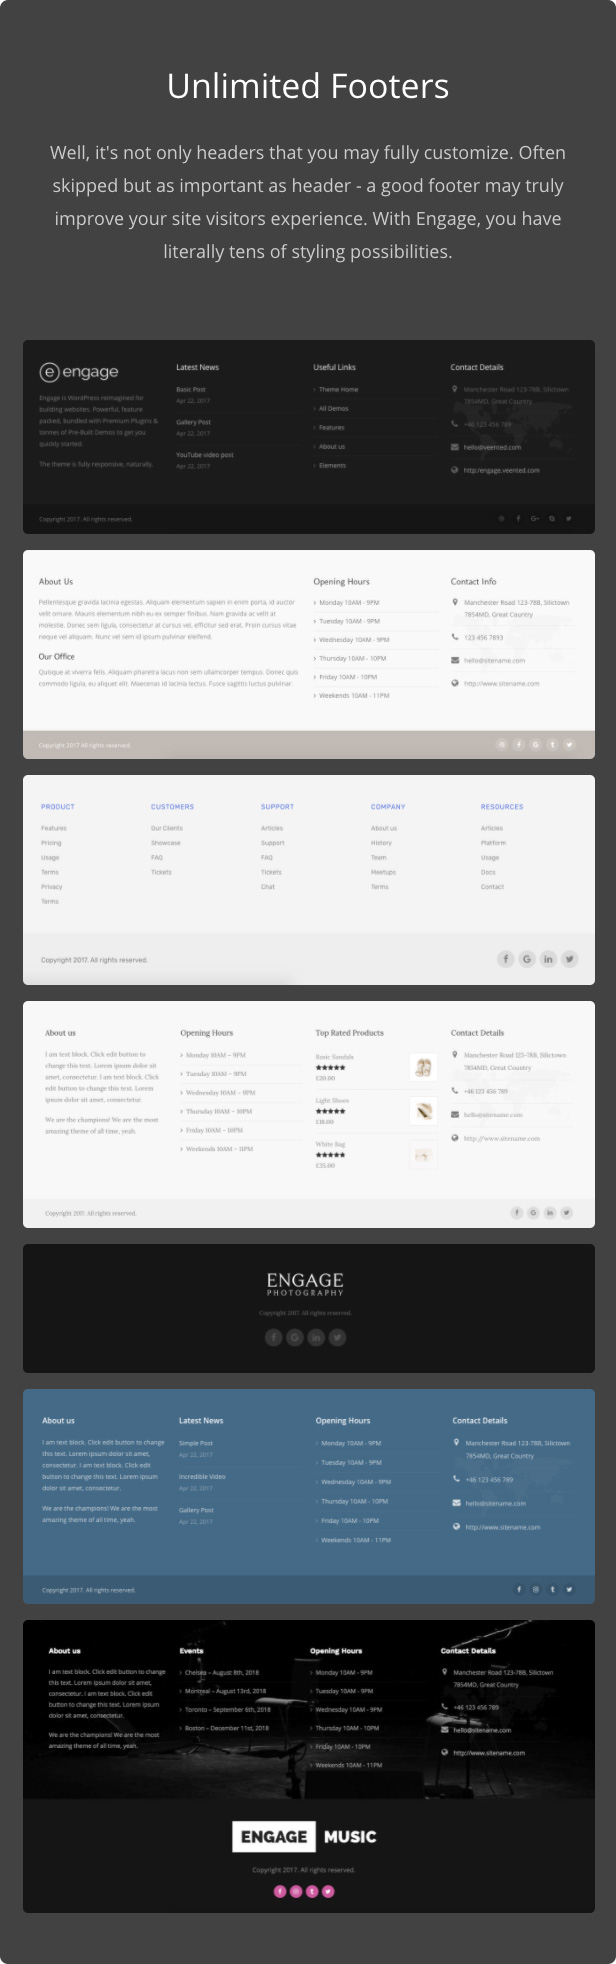 Engage - Responsive Multipurpose WordPress Theme - 18